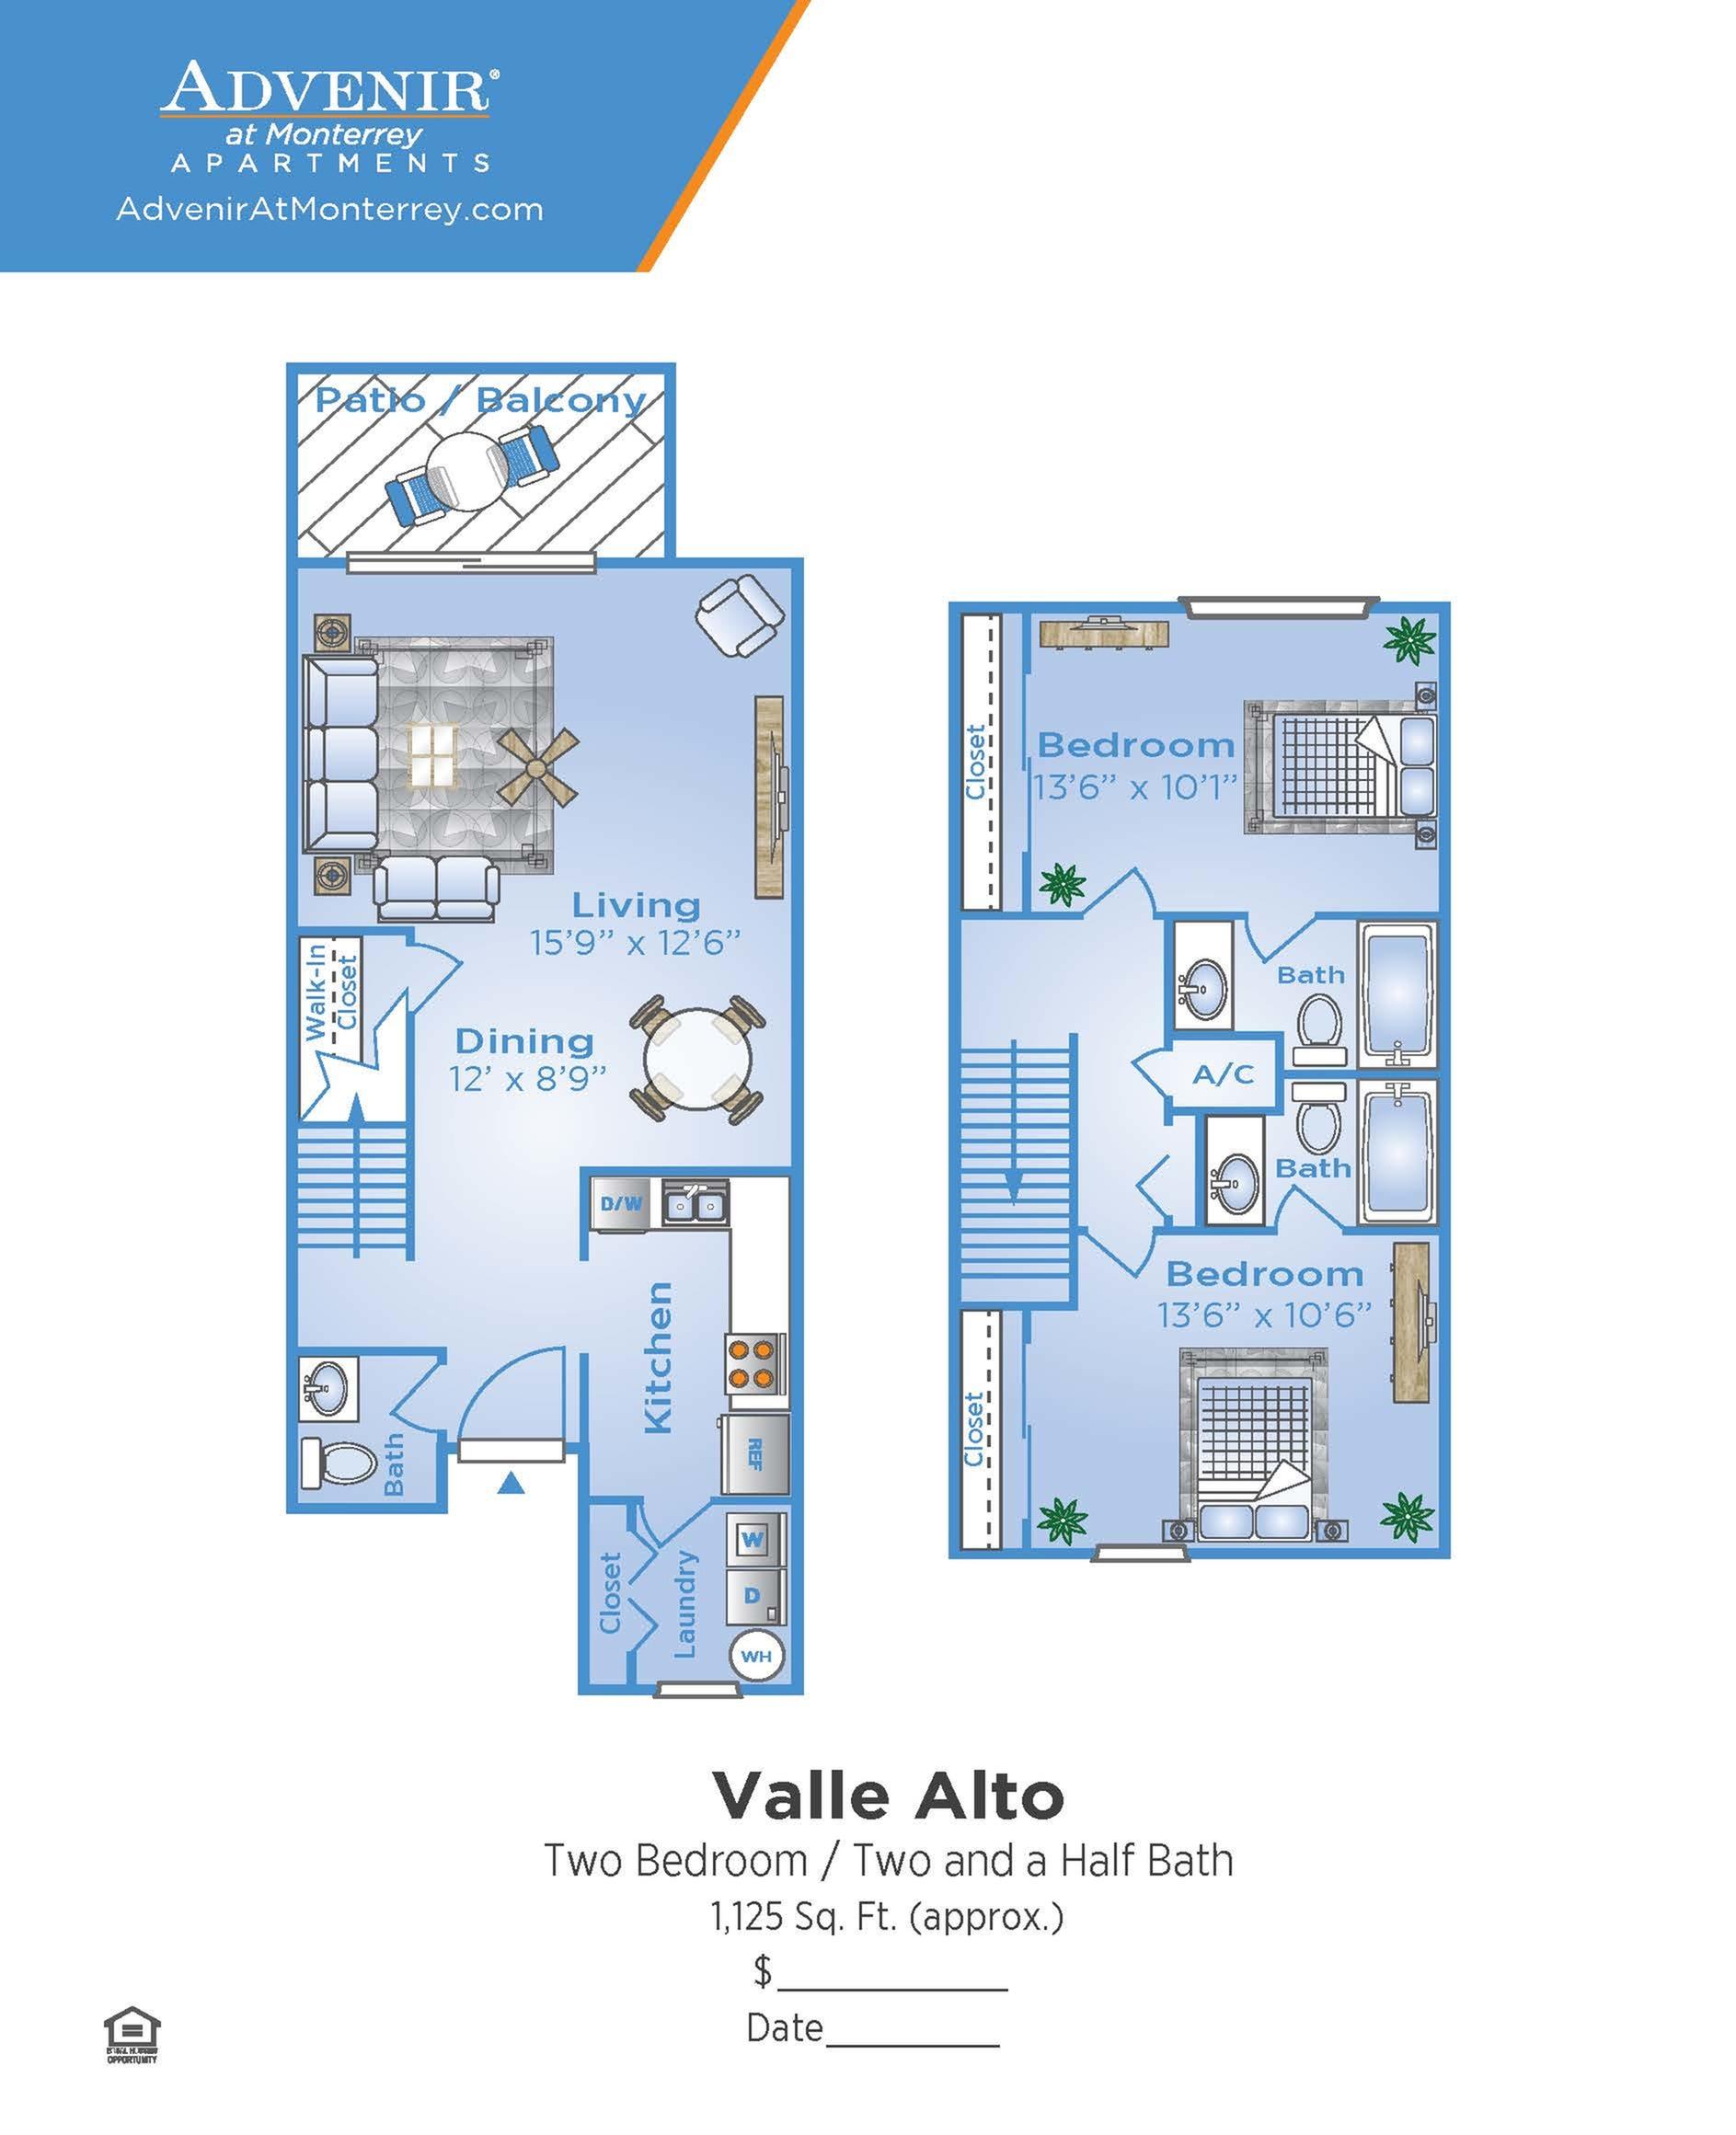 2 Bdrm Floor Plan | Apartments In Venice Florida For Rent | Advenir at Monterrey